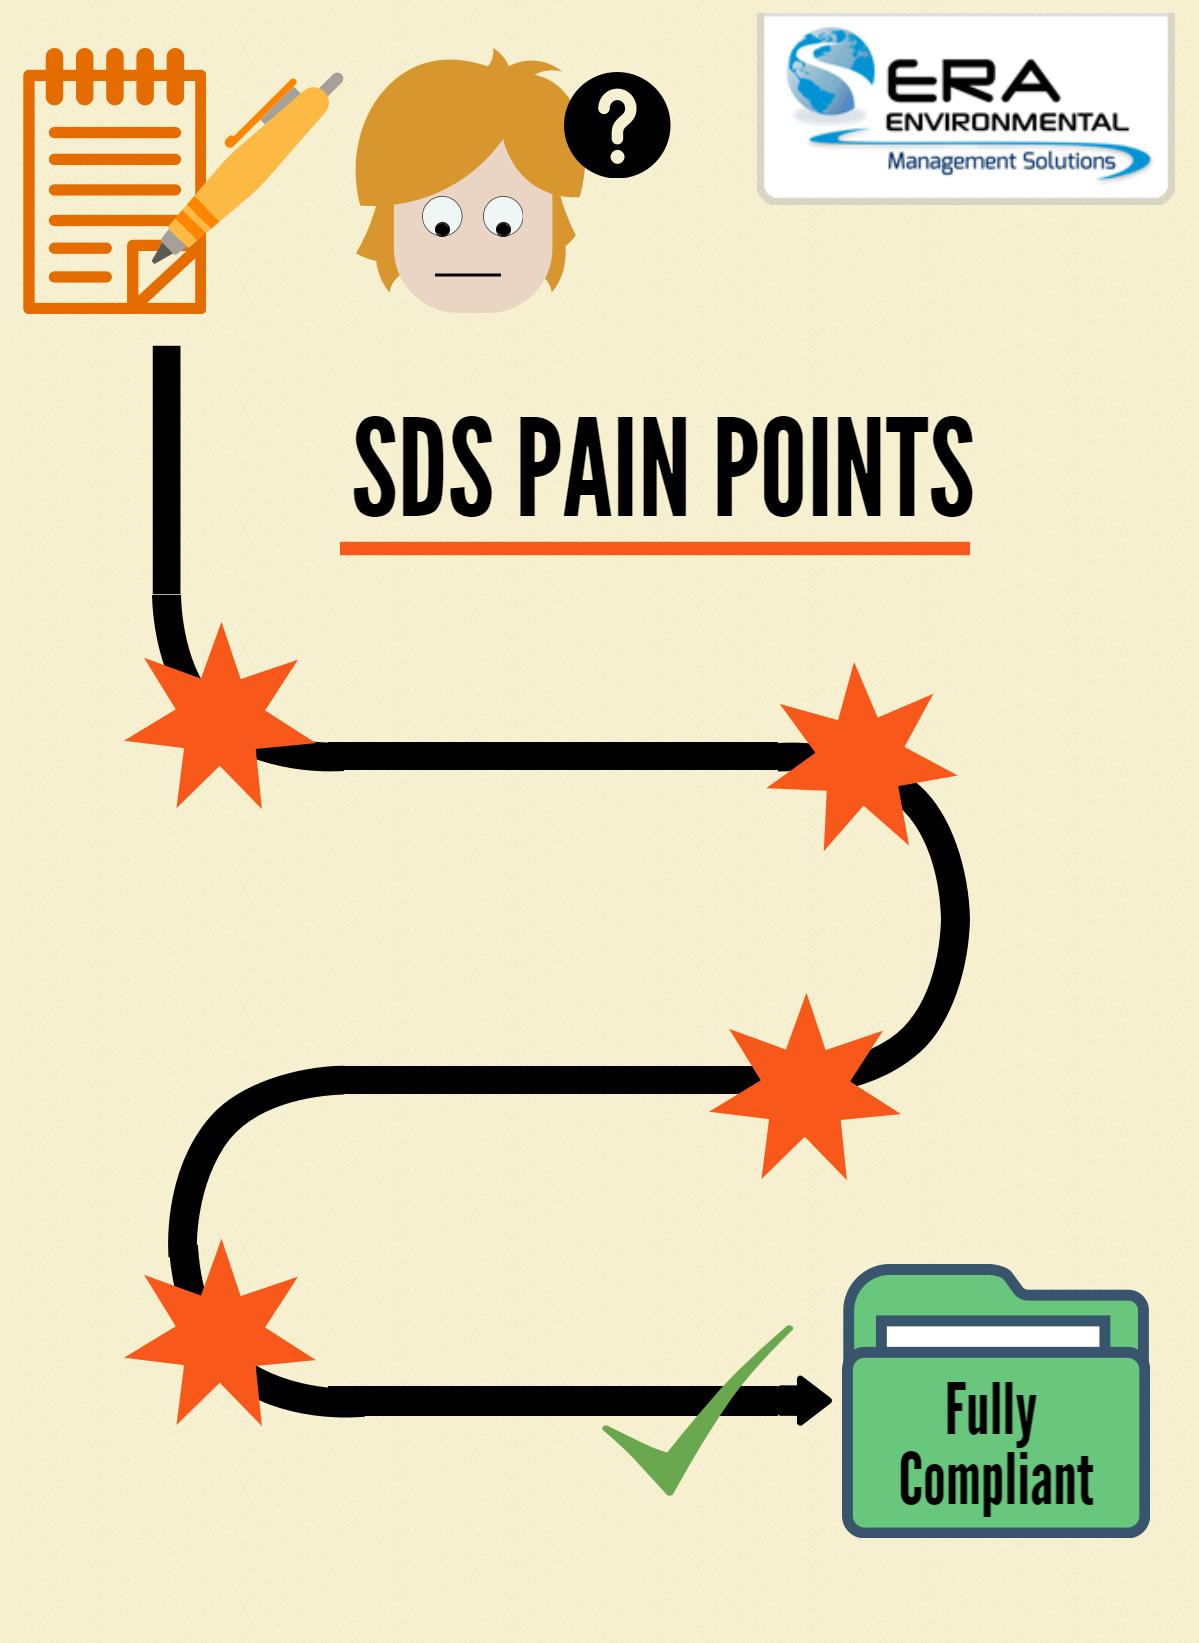 SDS Pain Points - Image.png